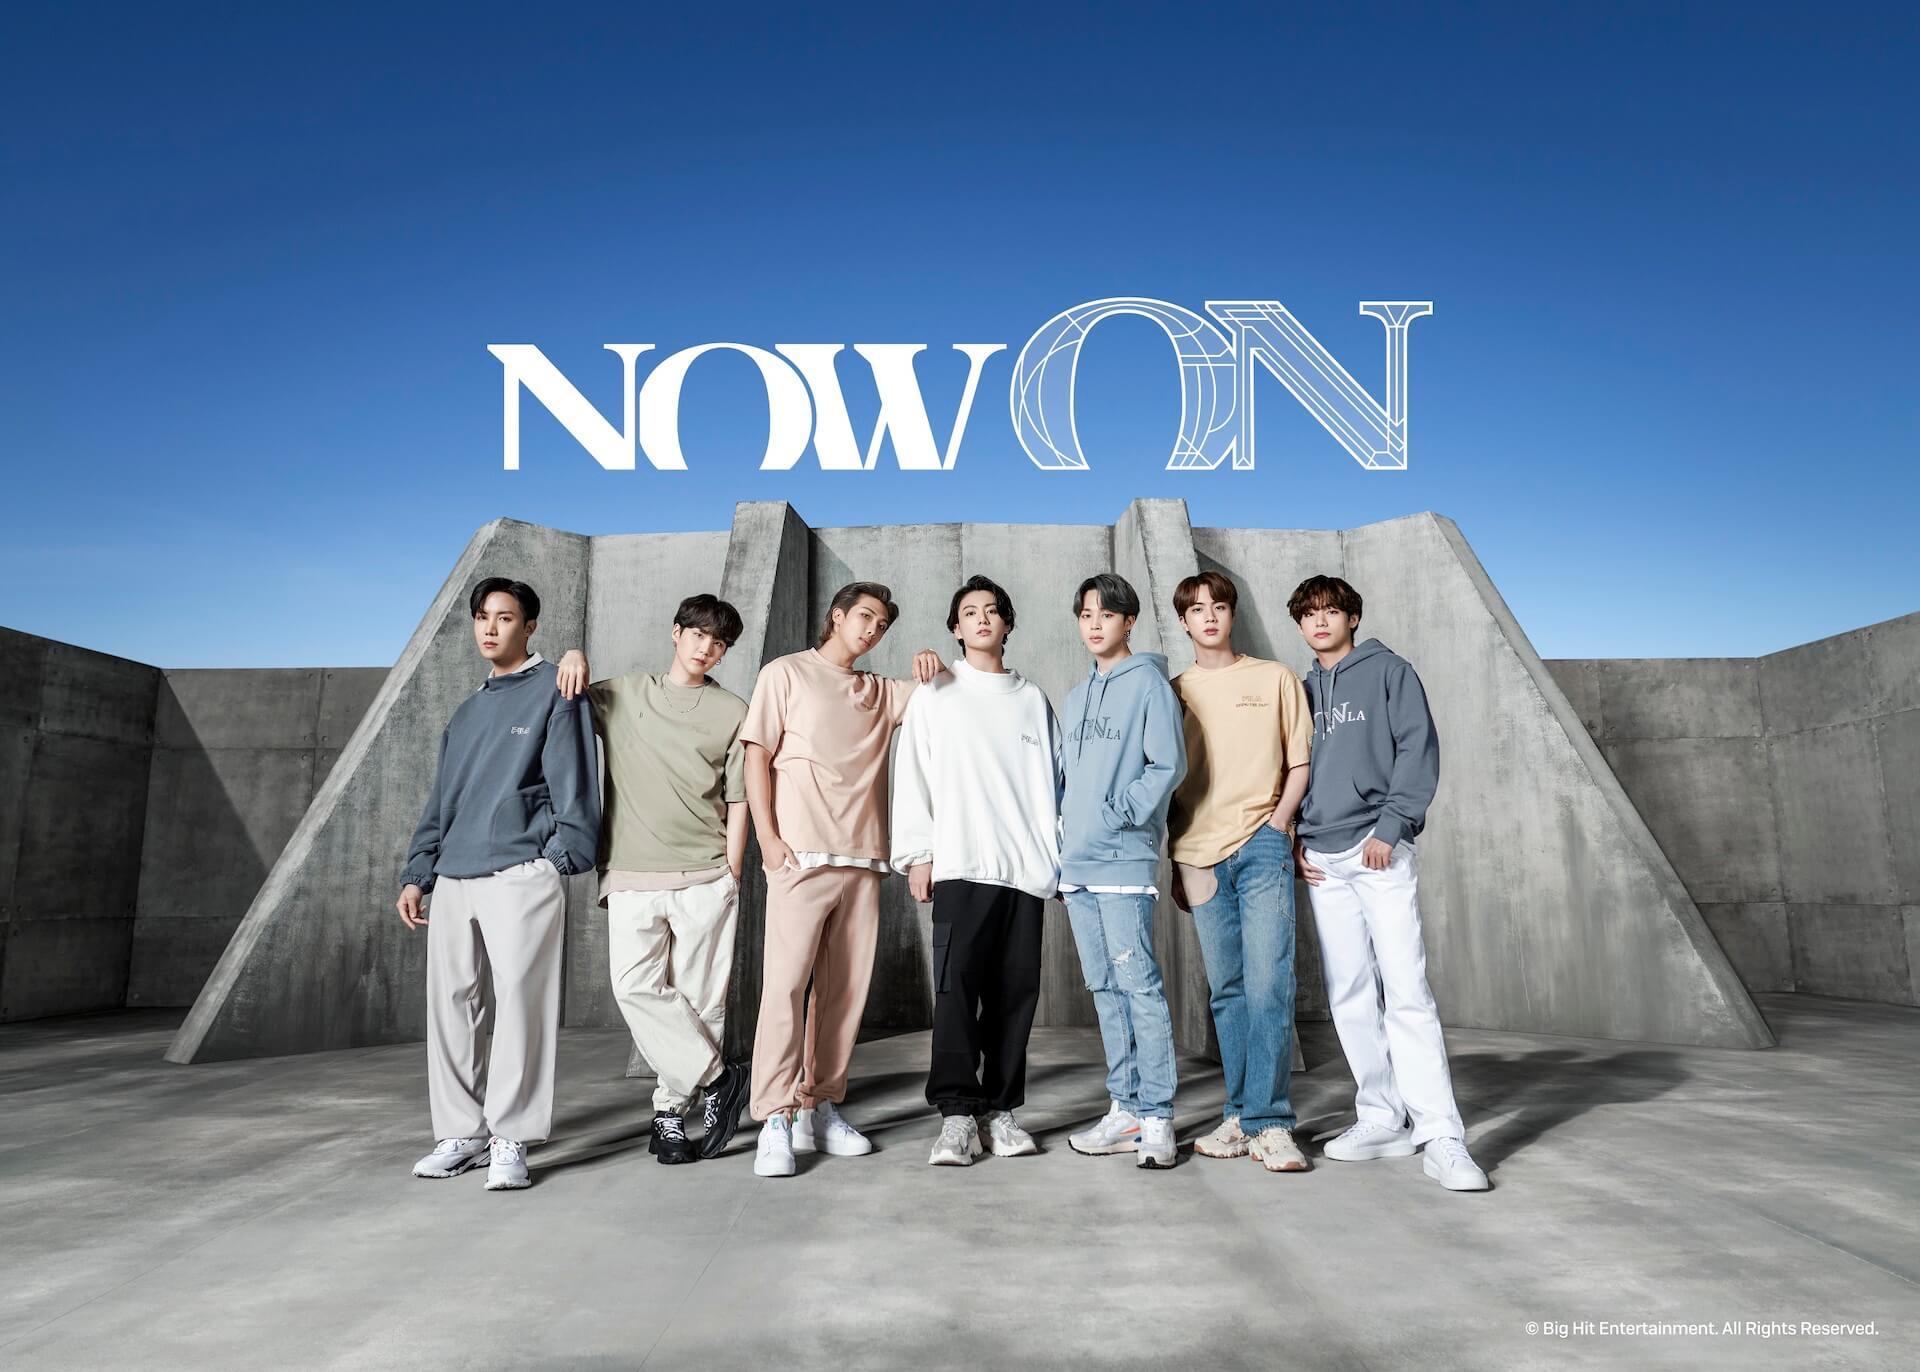 FILA × BTSの新コラボコレクション「Now ON」が今週先行予約販売開始!コラボ初のメンバー着用ビジュアルが解禁 life210621_fila_bts_1